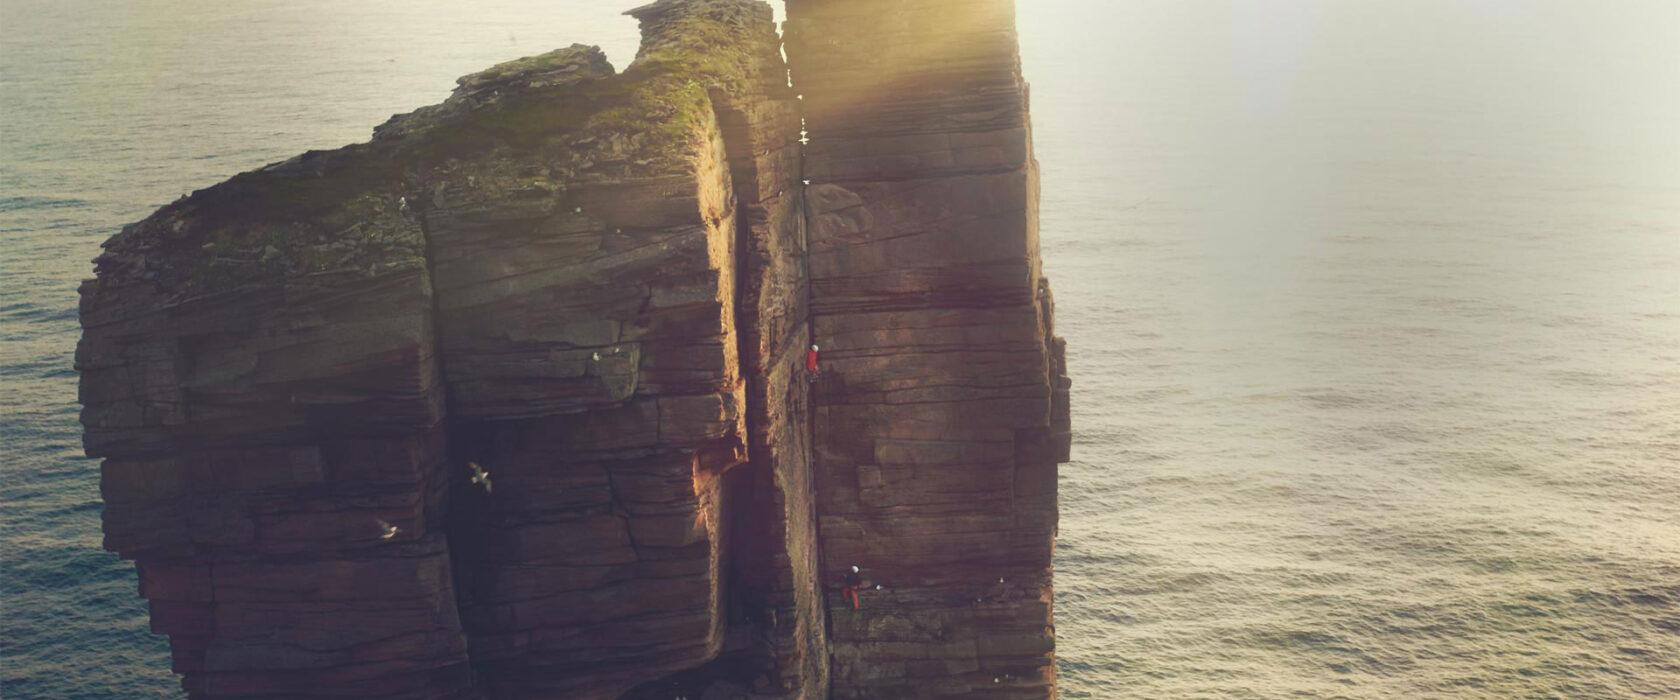 Climbing Blind Film